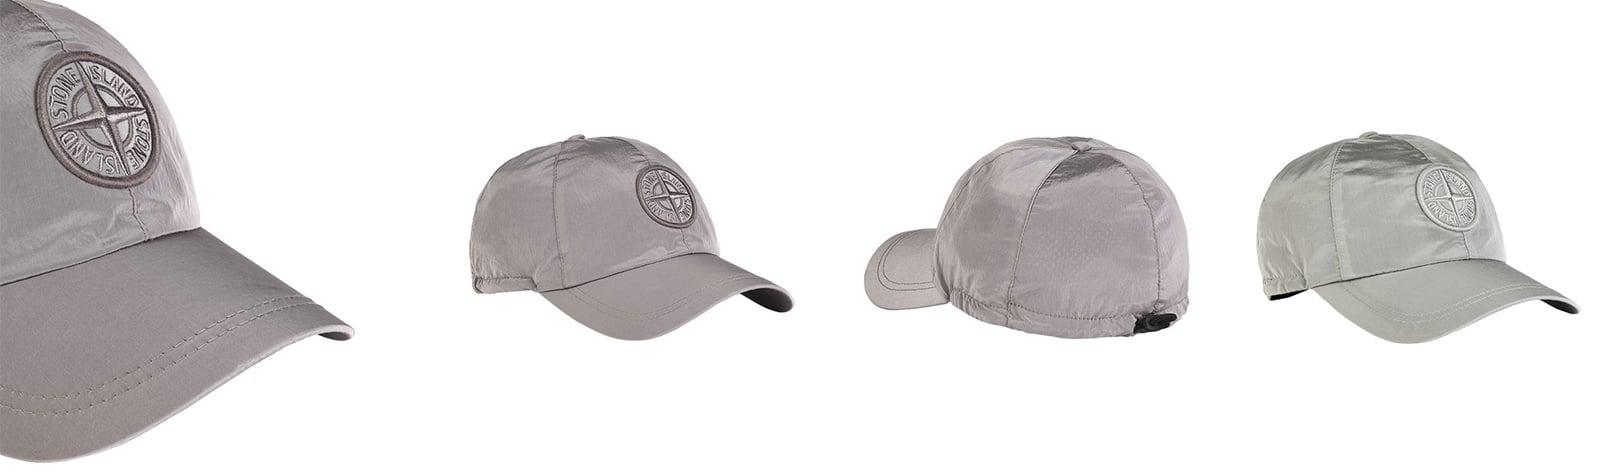 Stone Island Caps AW18/19